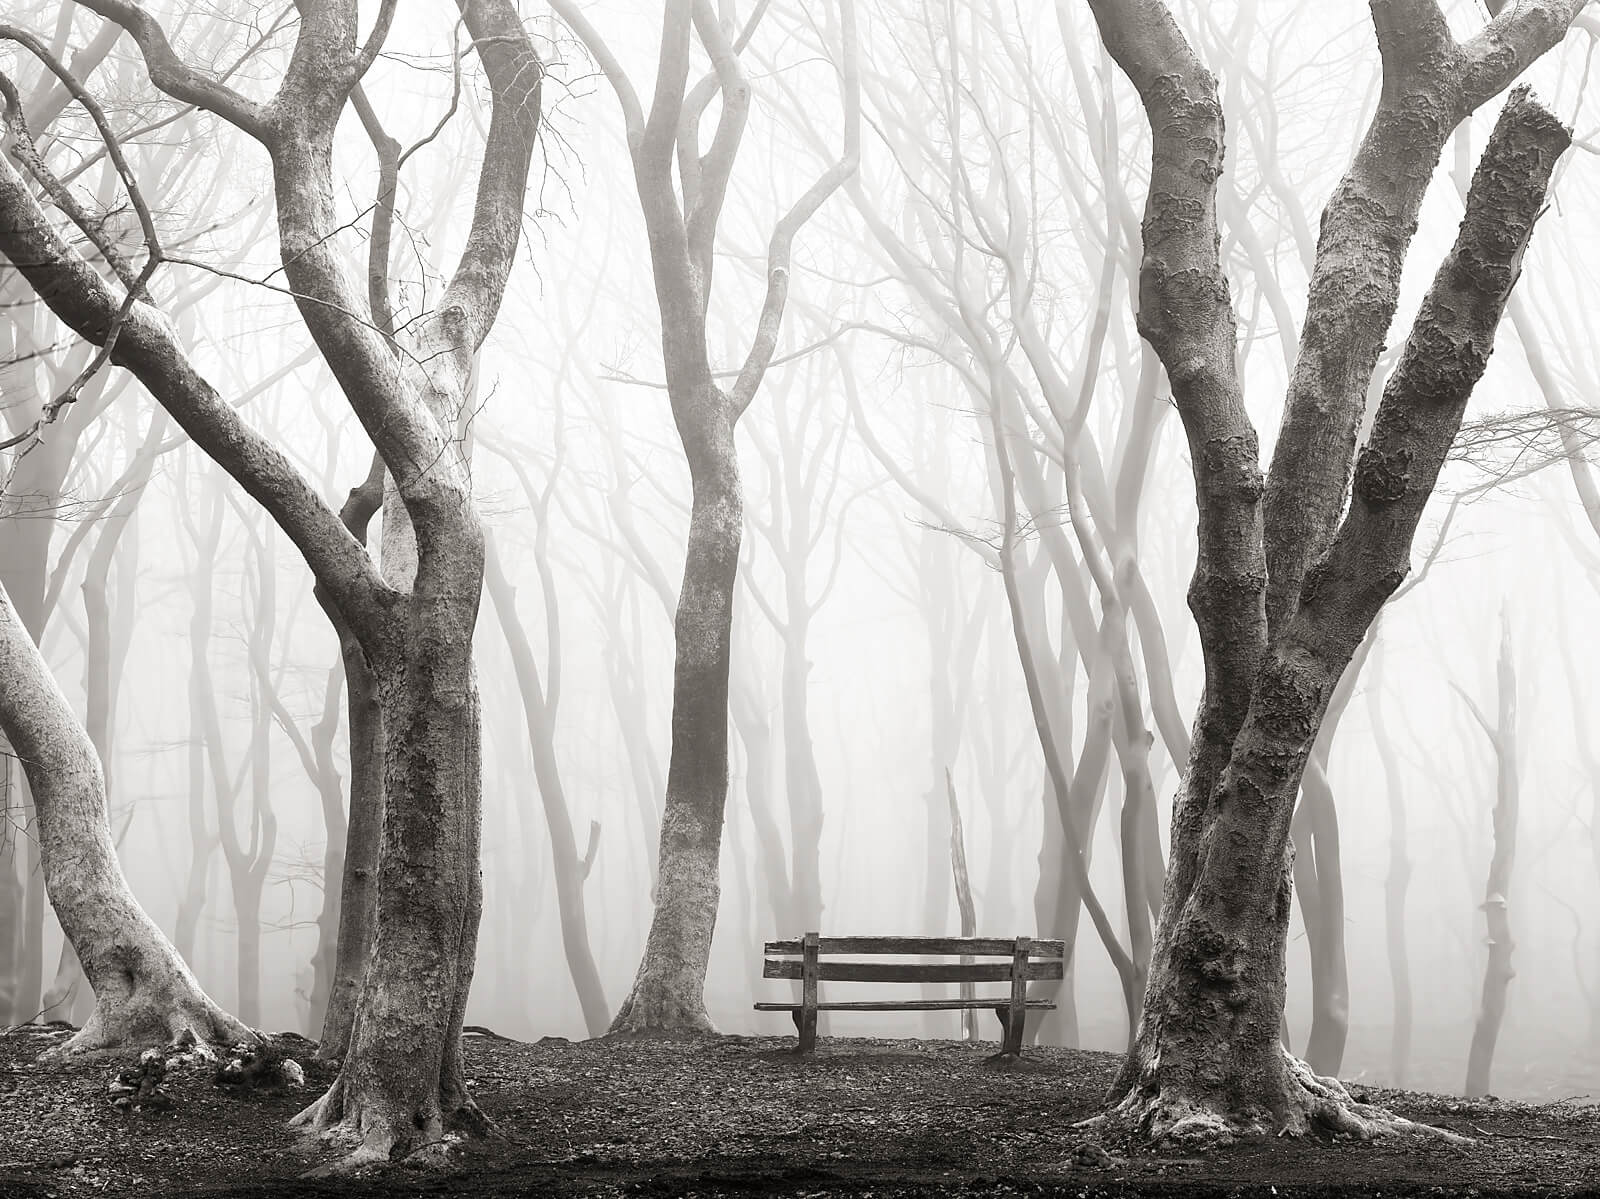 a-misty-view-monochrome-edit-2017